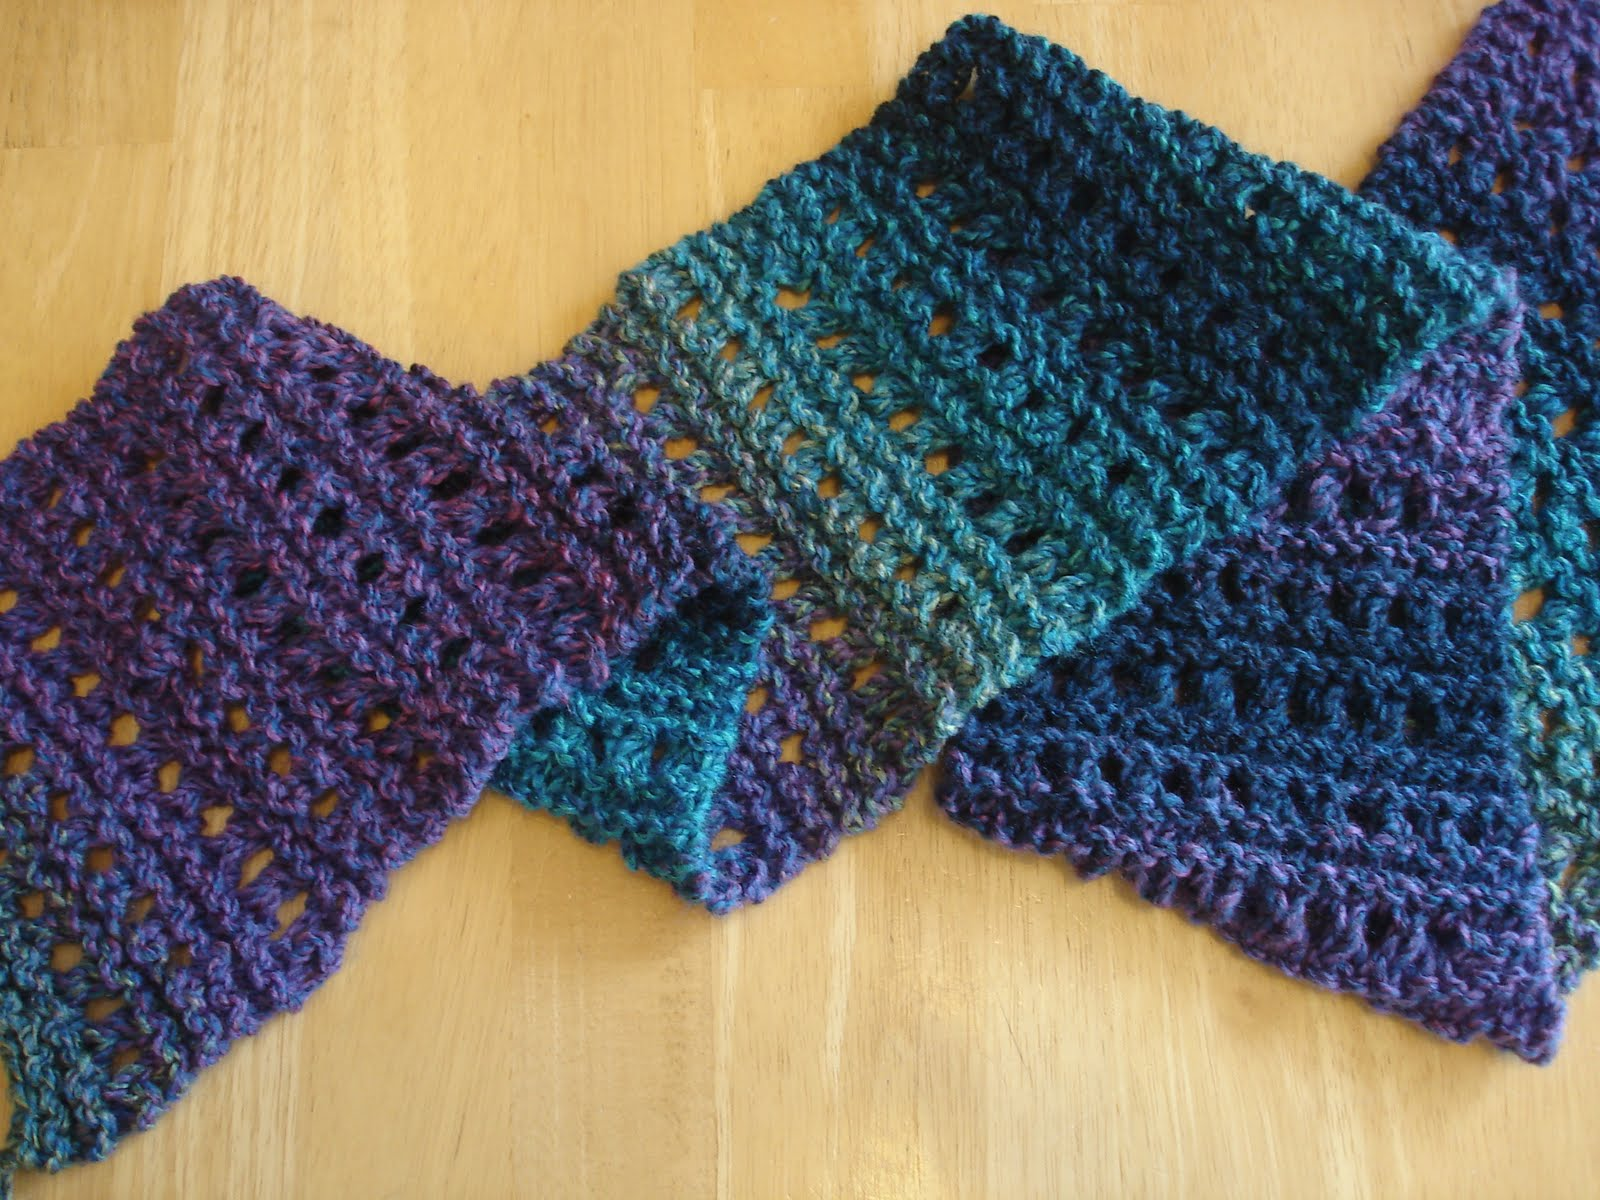 Free Knitting Patterns free knitting patterns qolfwkn